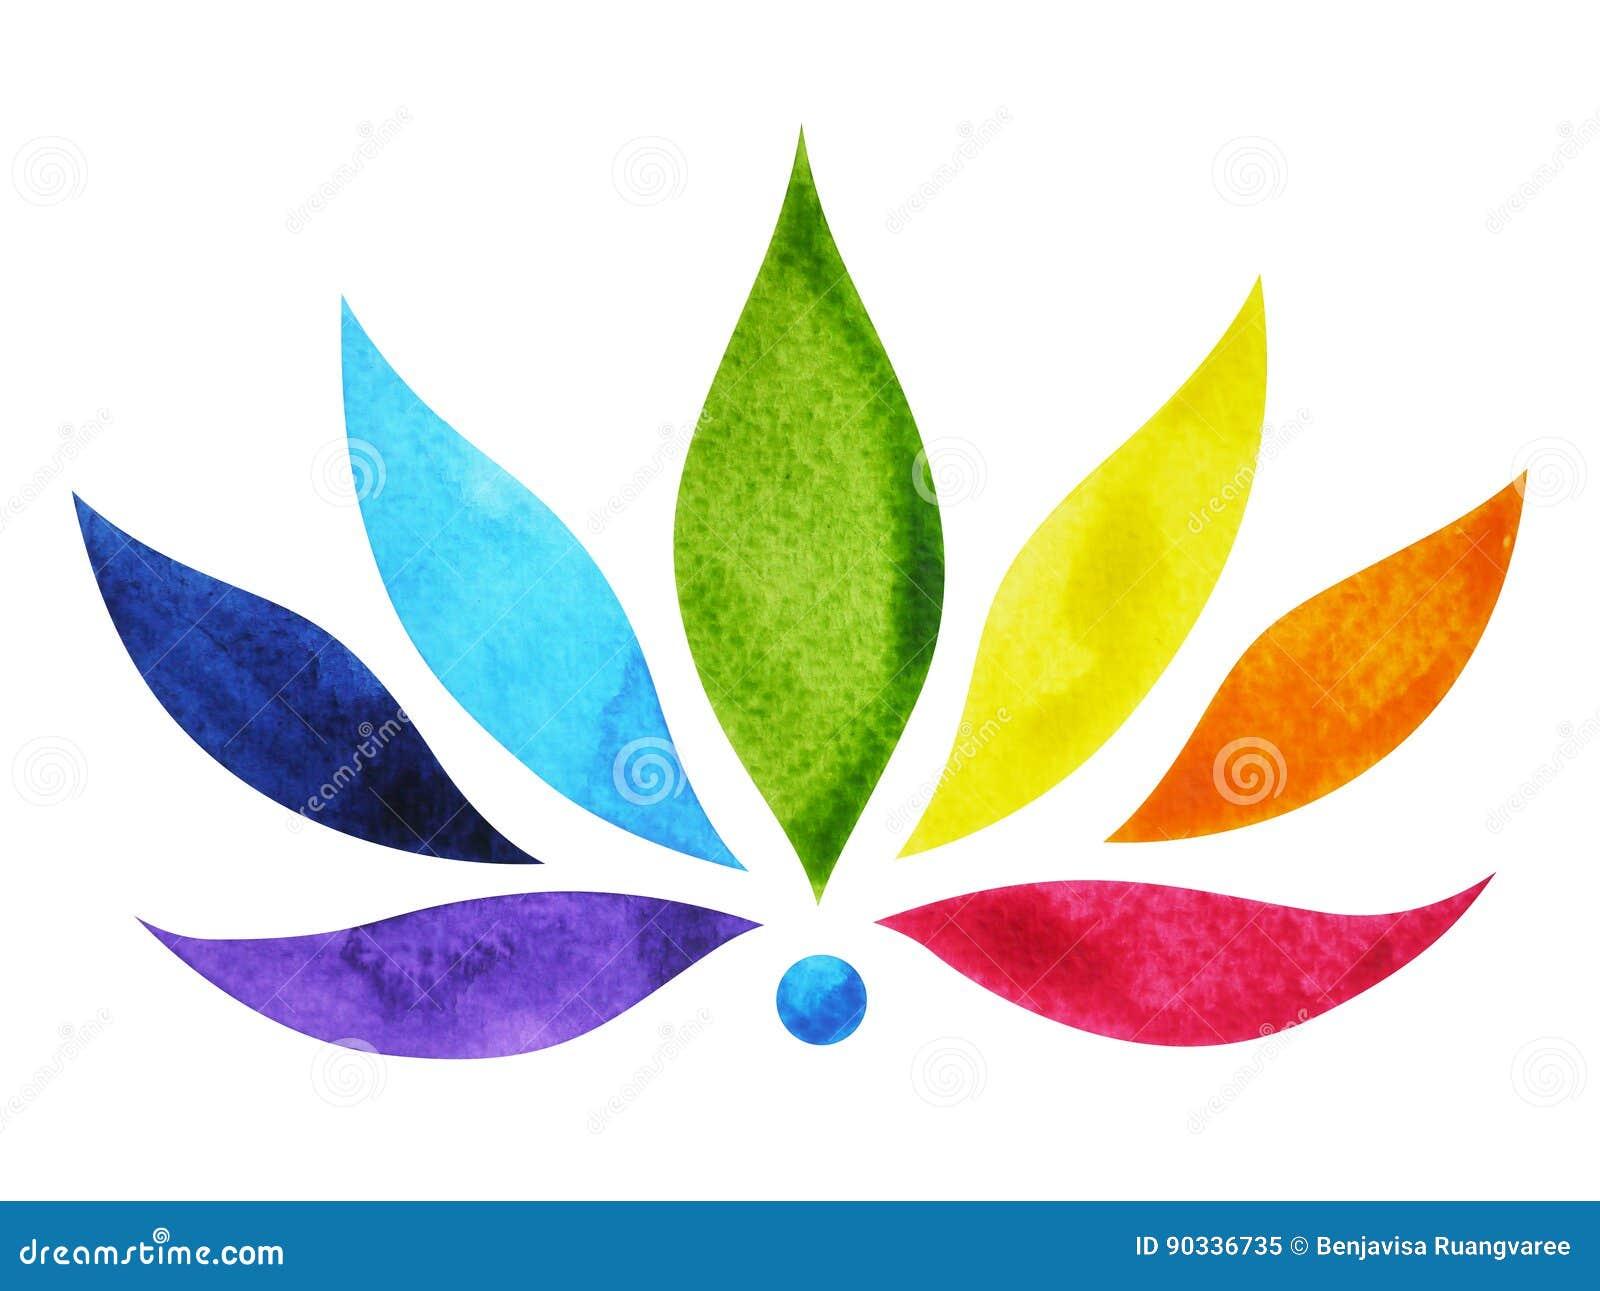 7 color of chakra sign symbol colorful lotus flower watercolor download 7 color of chakra sign symbol colorful lotus flower watercolor painting stock illustration mightylinksfo